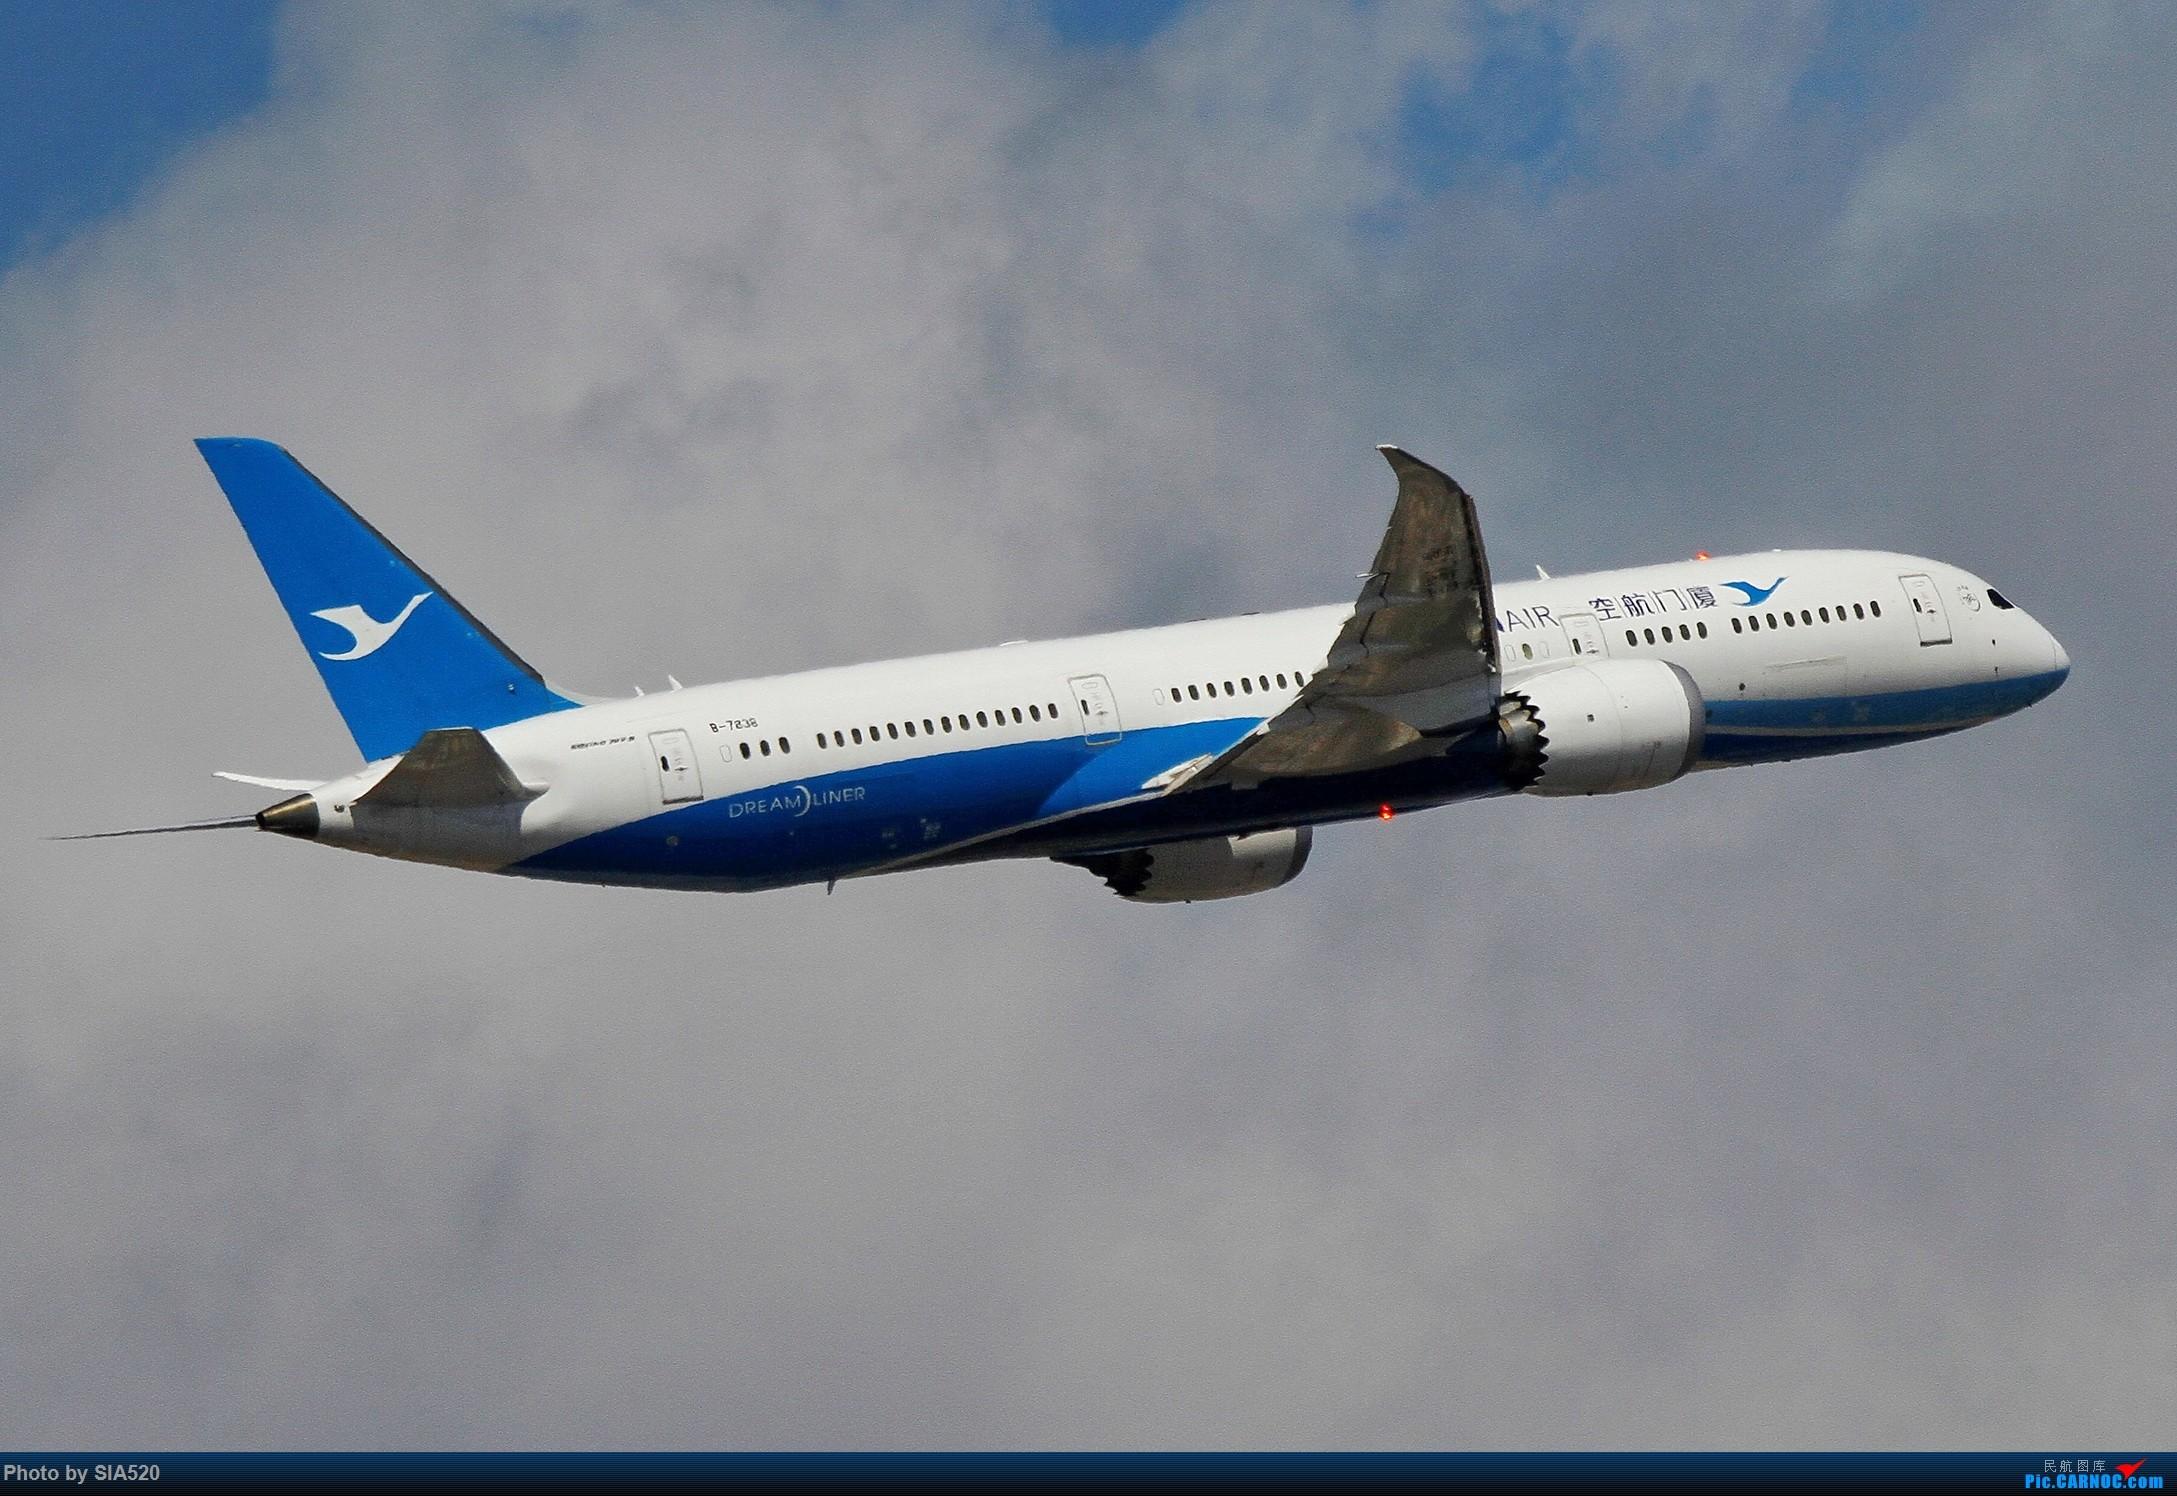 Re:[原创]北京人儿在三亚—600mm解锁凤凰 BOEING 787-9 B-7838 中国三亚凤凰国际机场